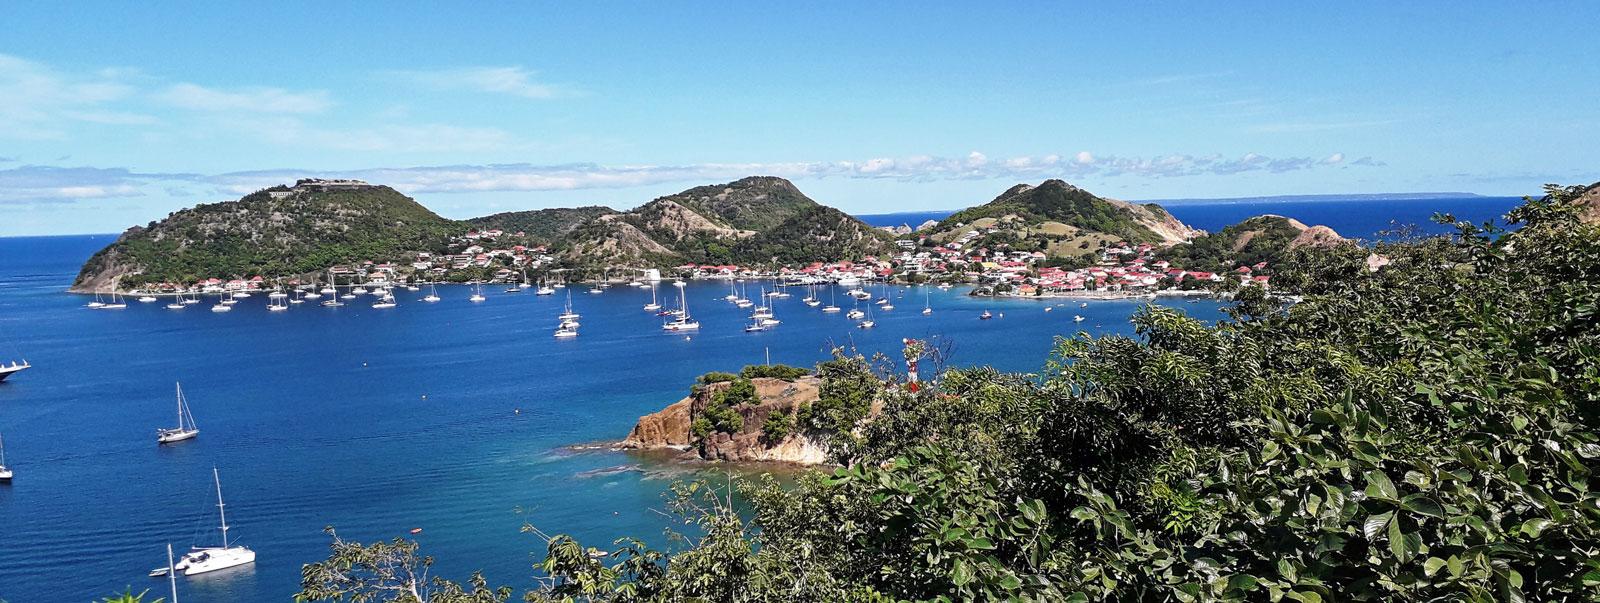 Les Saintes, i Caraibi pittoreschi come un quadro d'autore